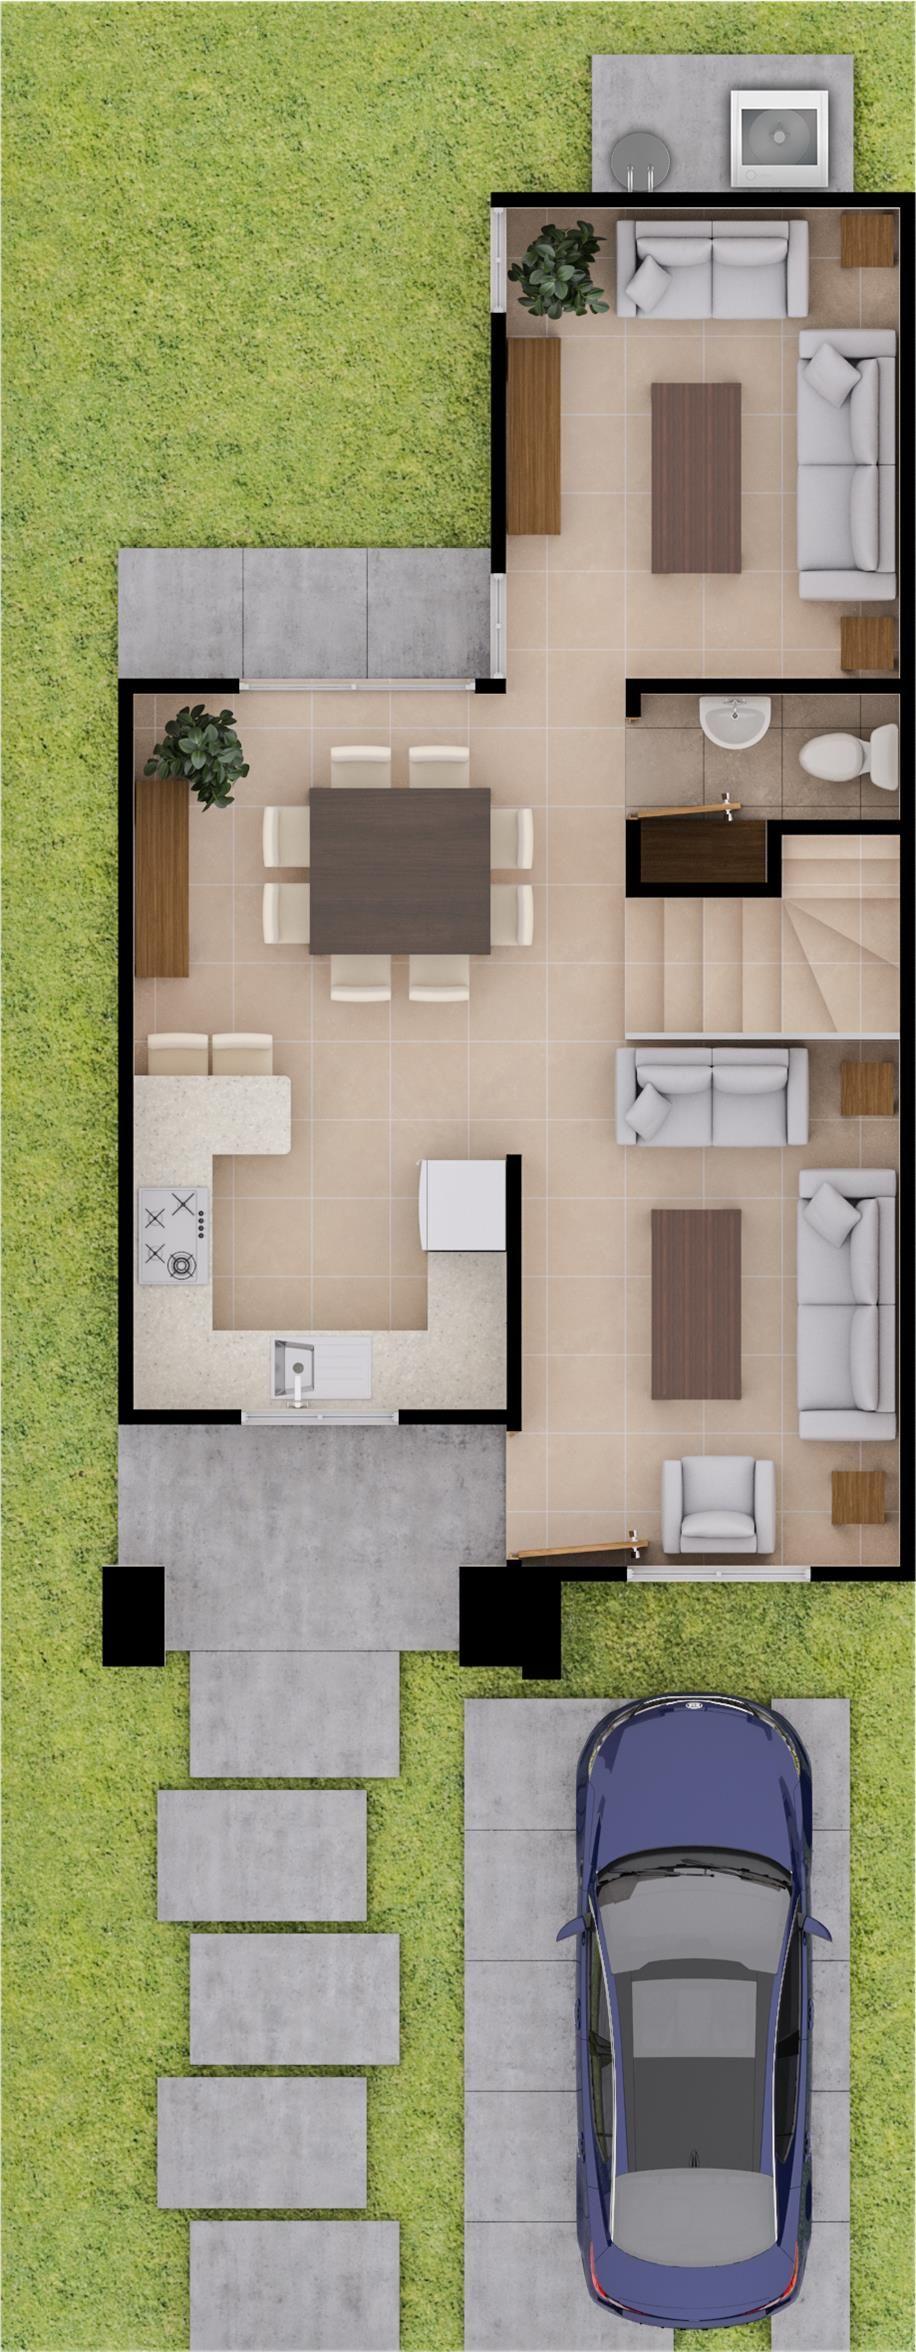 Mod valencia pb house planos de casas for Planos casas pequenas modernas